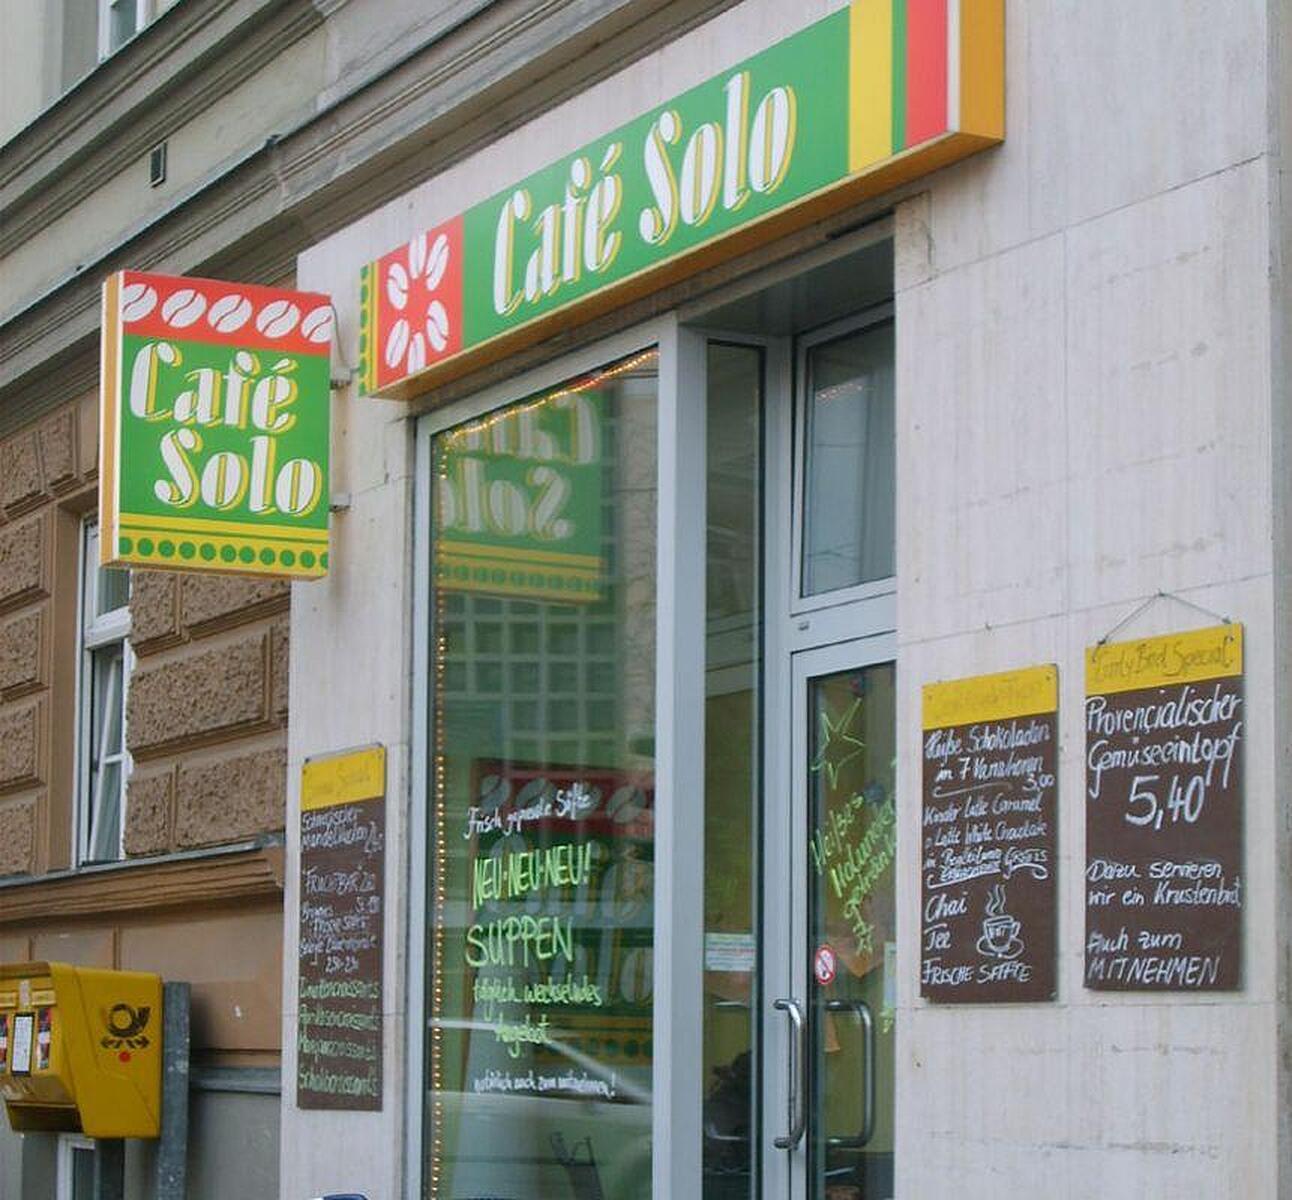 Caf 233 Solo Preysingstr Haidhausen M 252 Nchen Cafe Solo